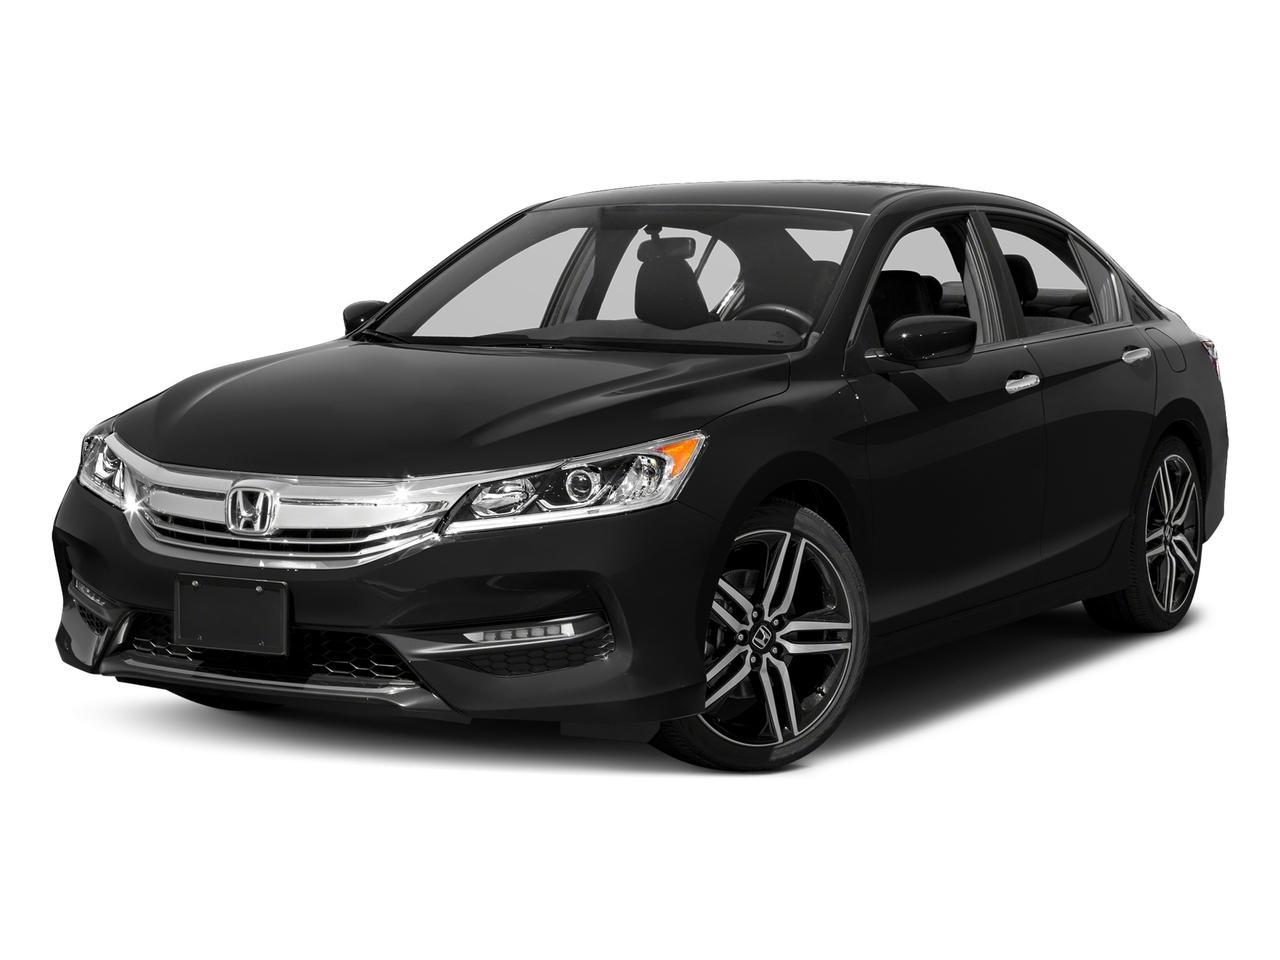 2017 Honda Accord Sedan Vehicle Photo in Houston, TX 77074